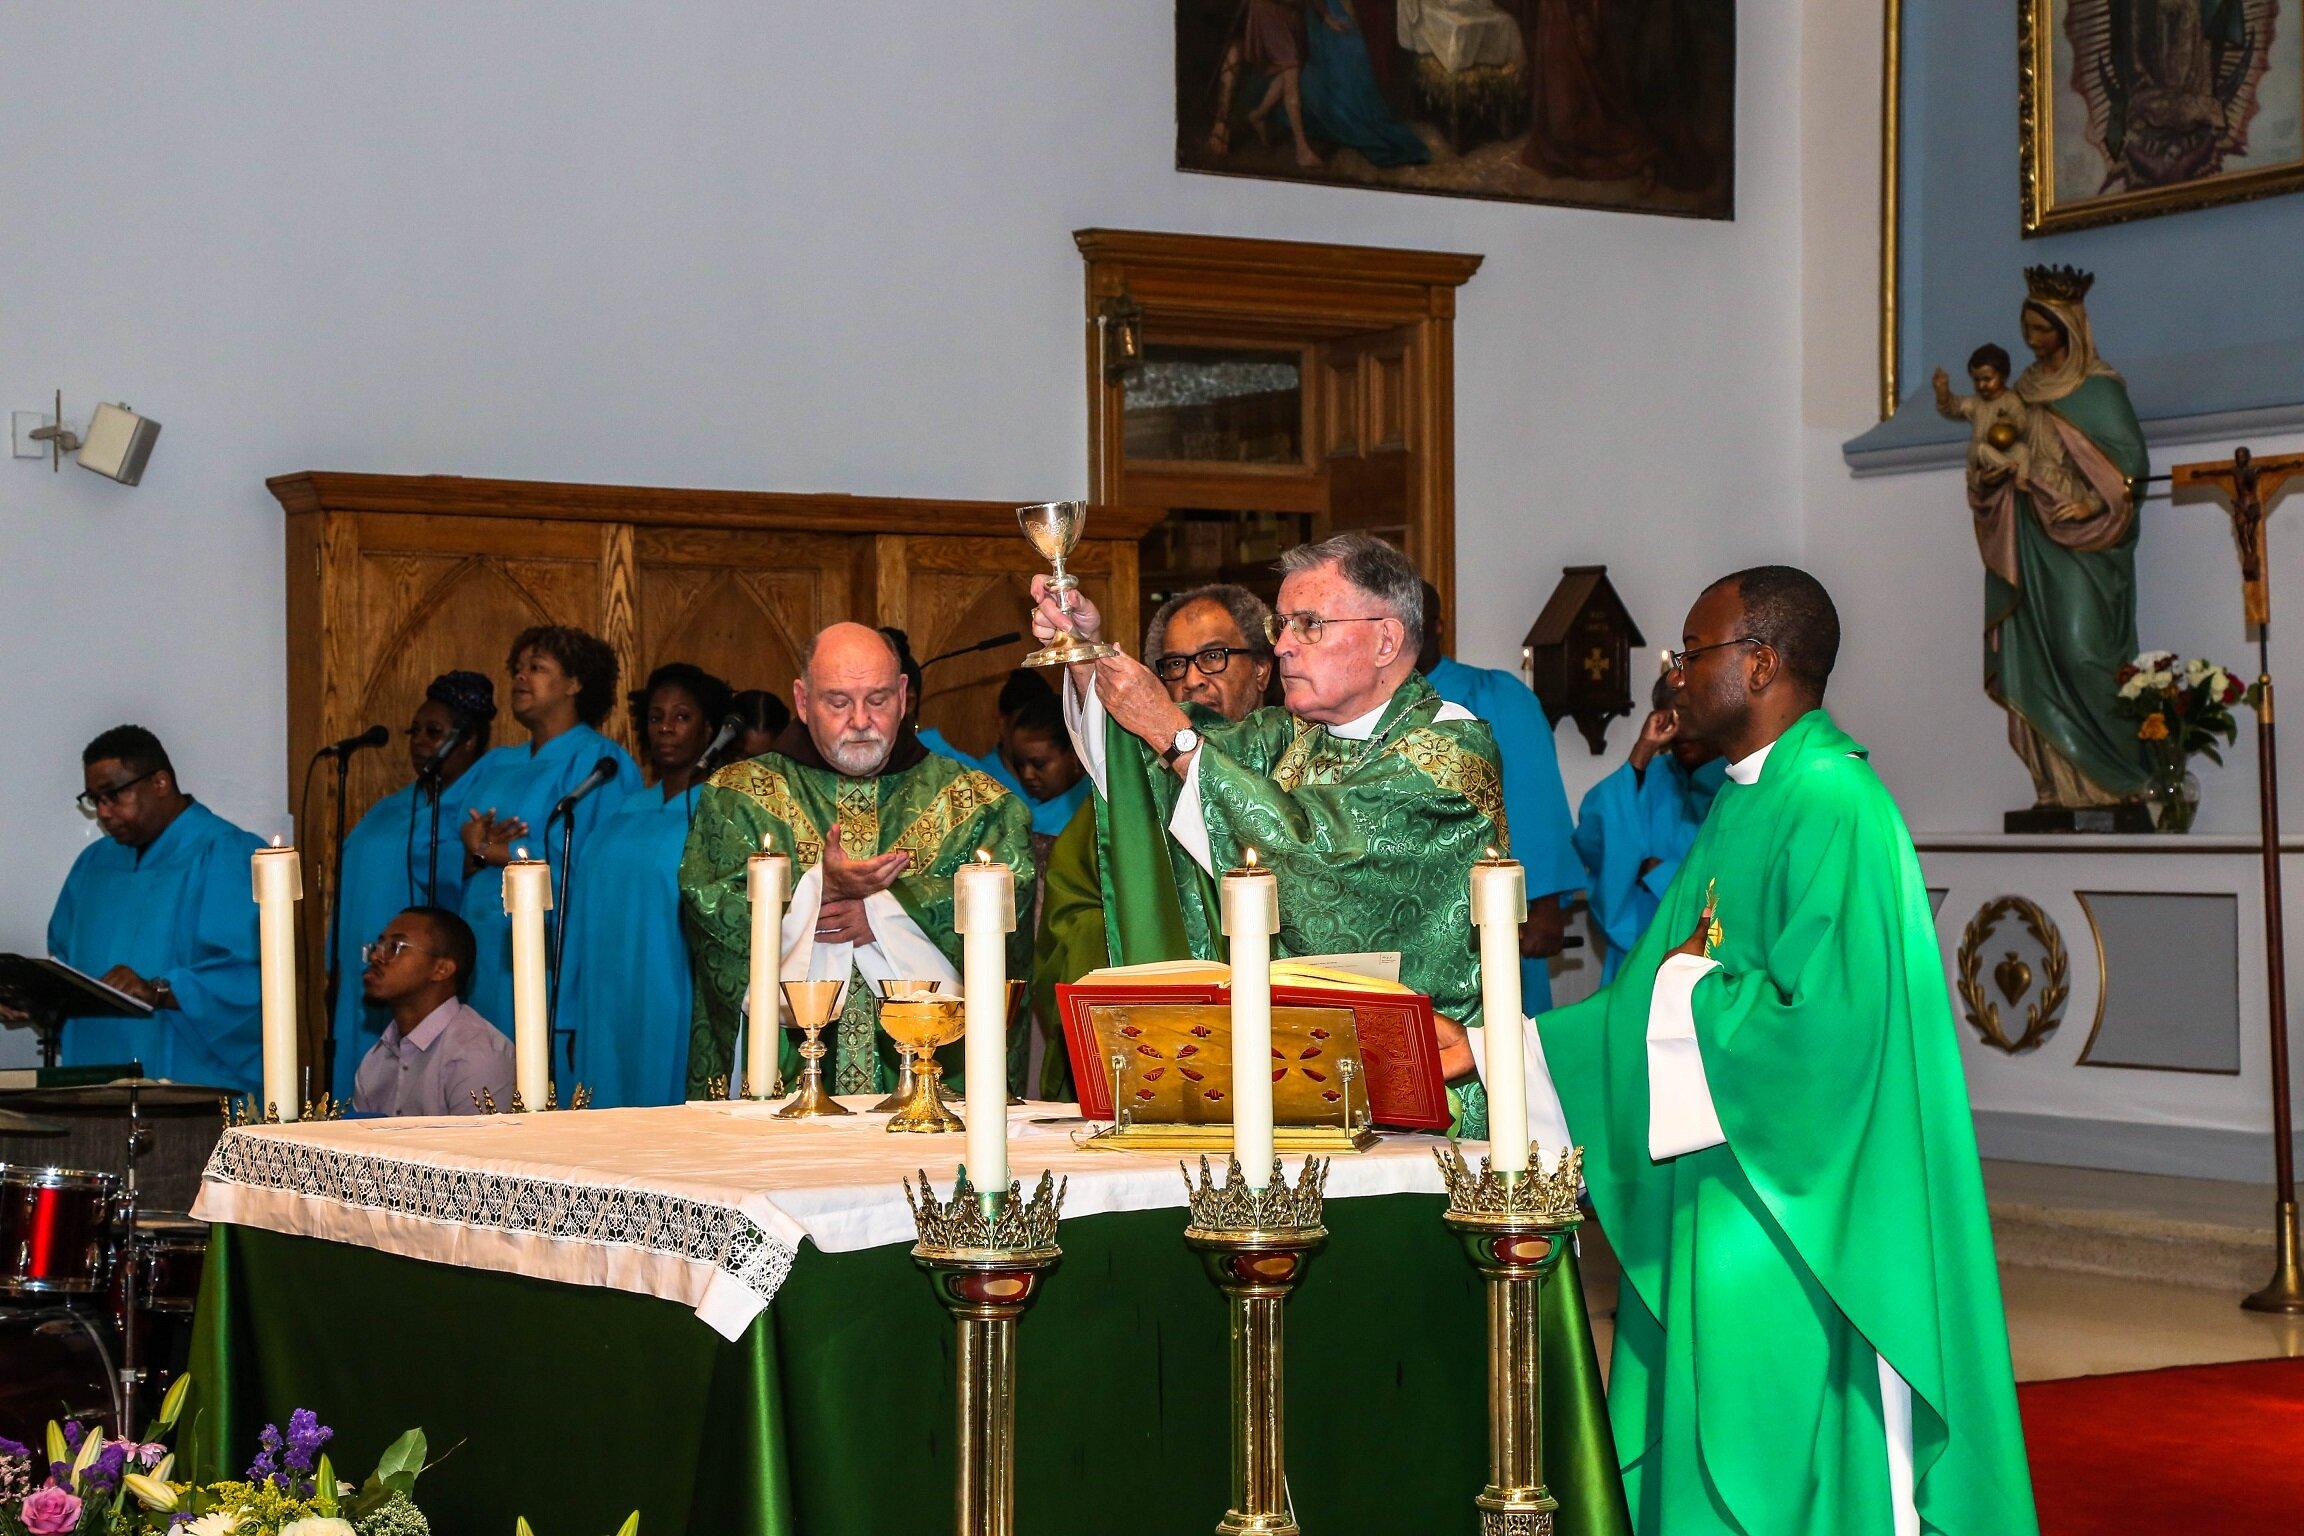 Mass Schedule St. Joseph of the Holy Family Catholic Church Harlem NY Parish 2 - 50.jpg